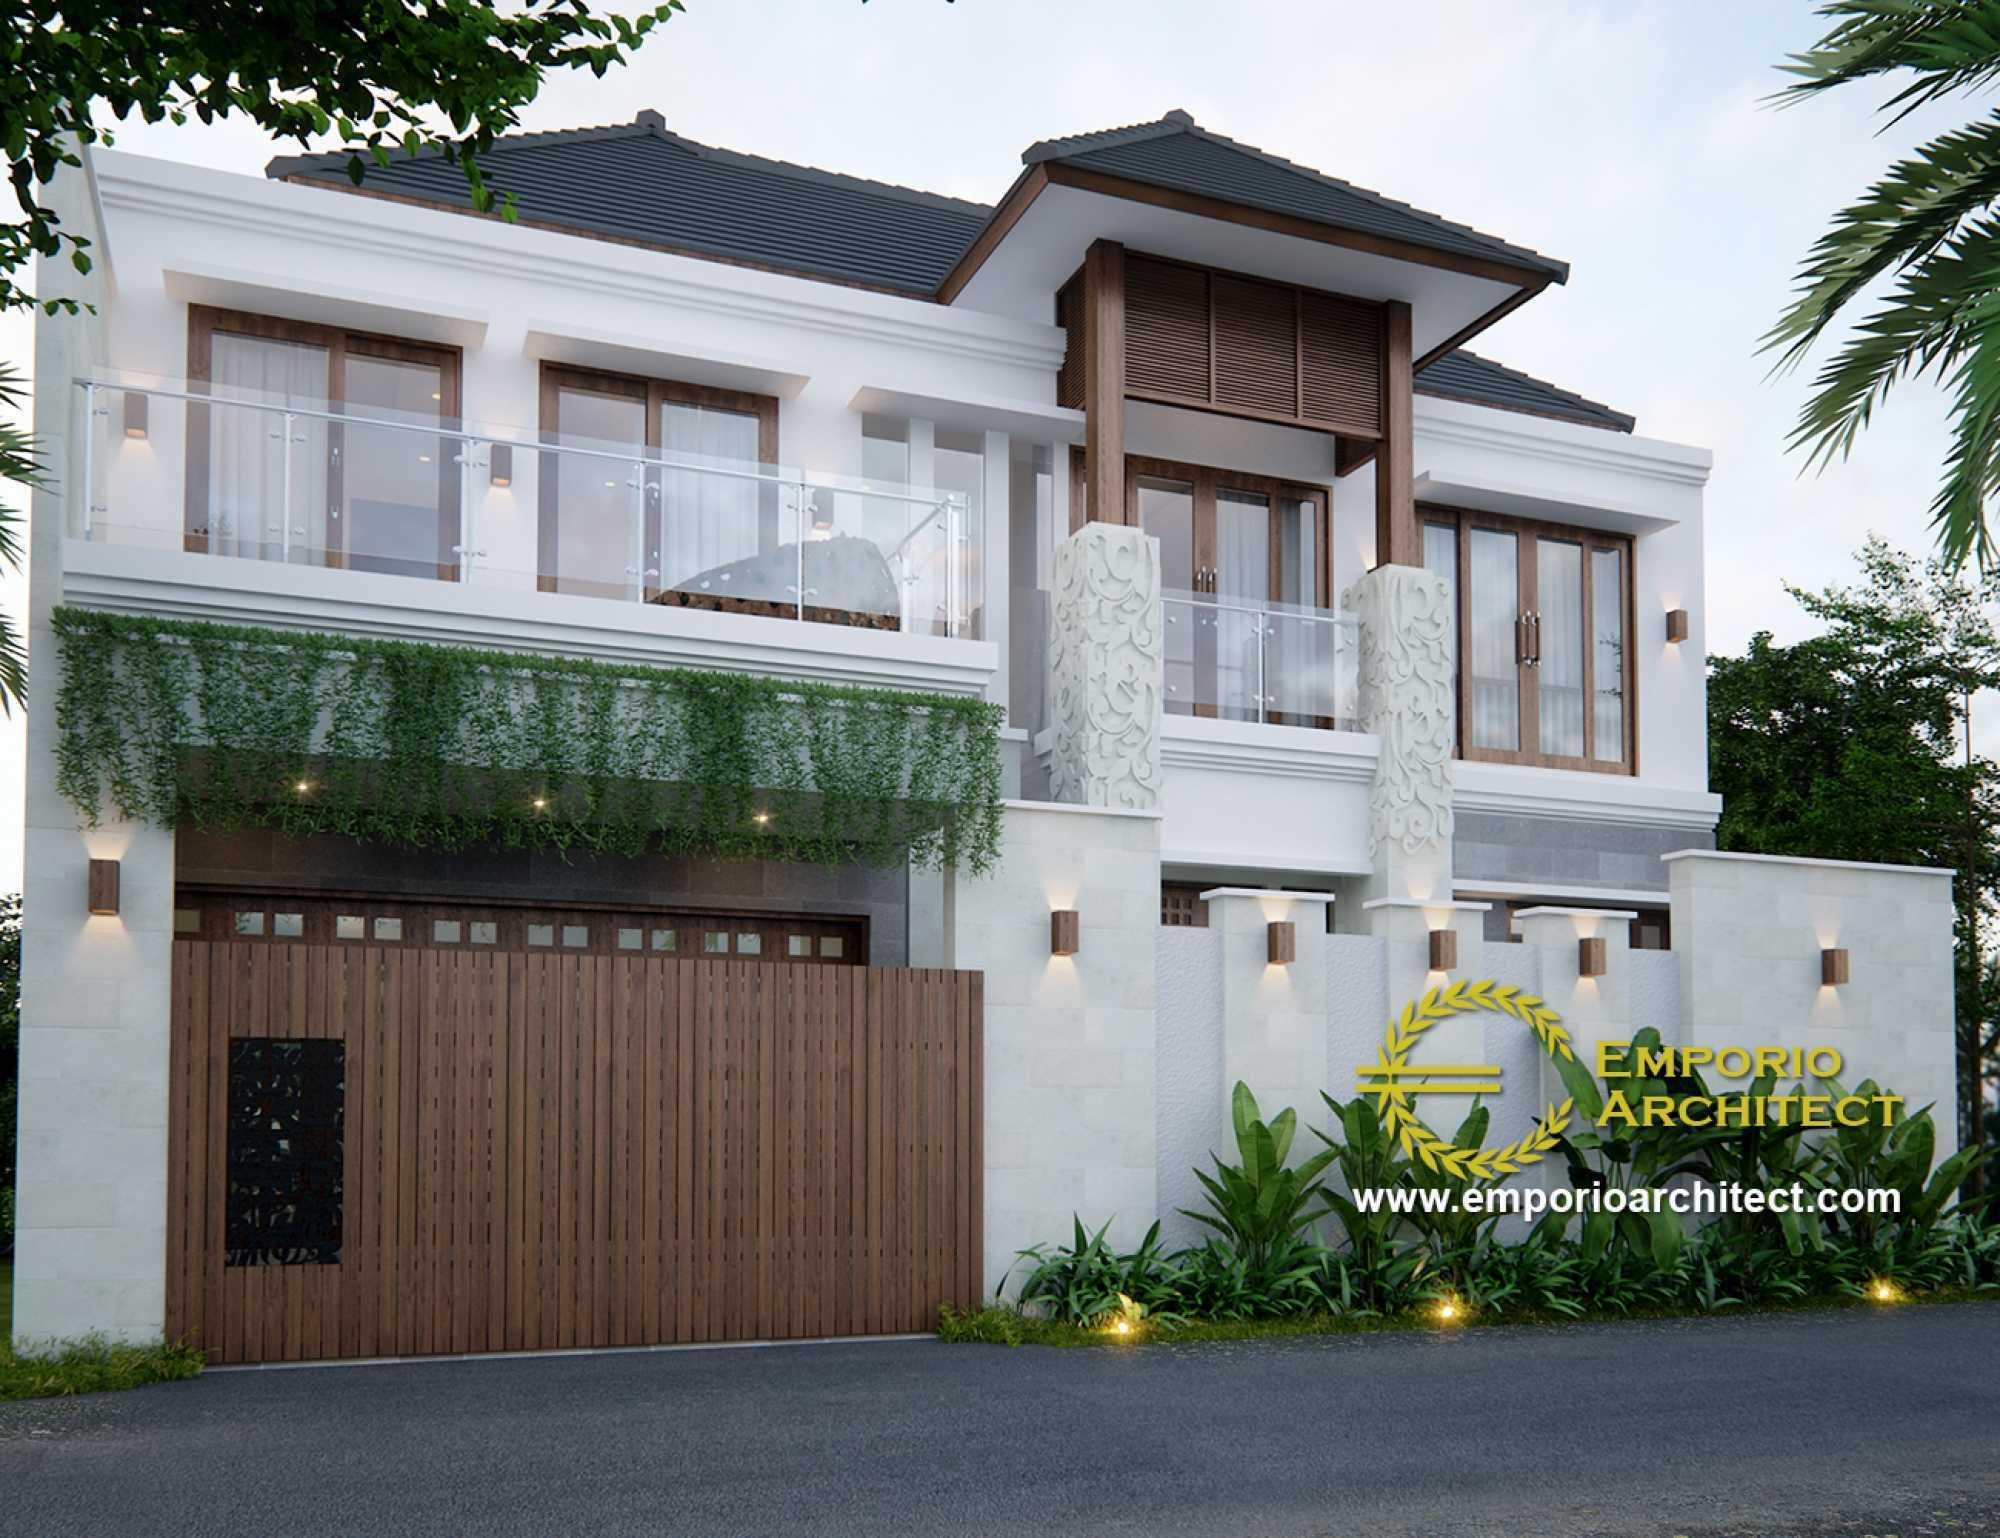 Emporio Architect Desain Rumah Villa Bali Tropis 333 @ Denpasar, Bali Kota Denpasar, Bali, Indonesia Kota Denpasar, Bali, Indonesia Emporio-Architect-Desain-Rumah-Villa-Bali-Tropis-333-Denpasar-Bali   74938